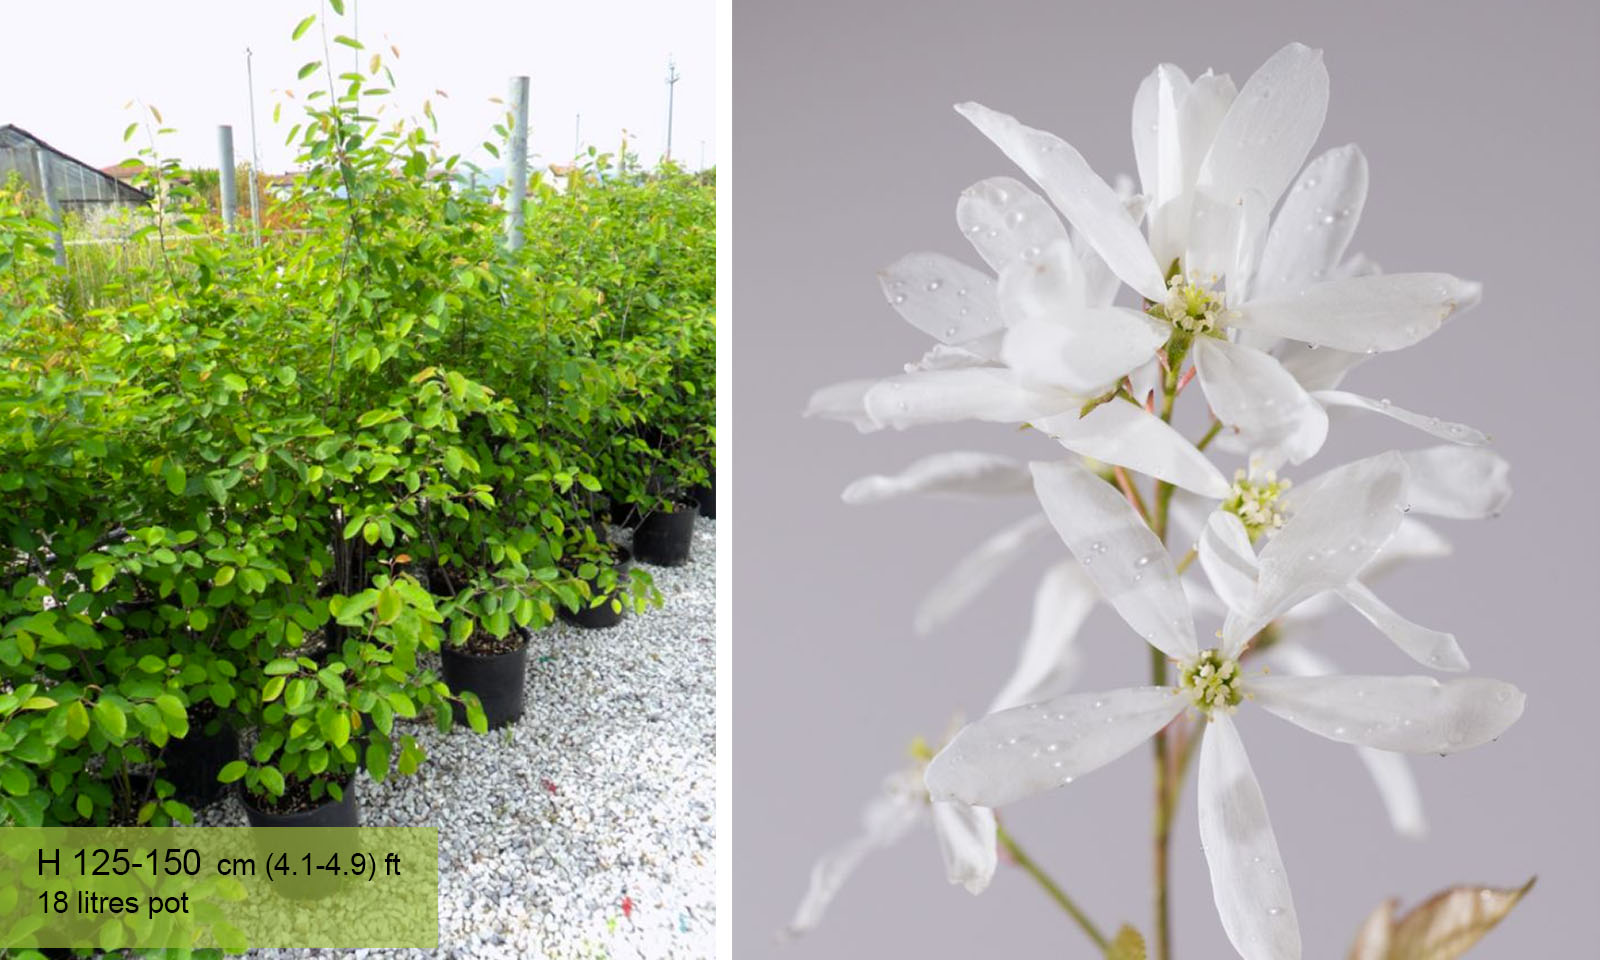 Amelanchier Laevis (Juneberry Tree / Smooth Serviceberry) - Shrub